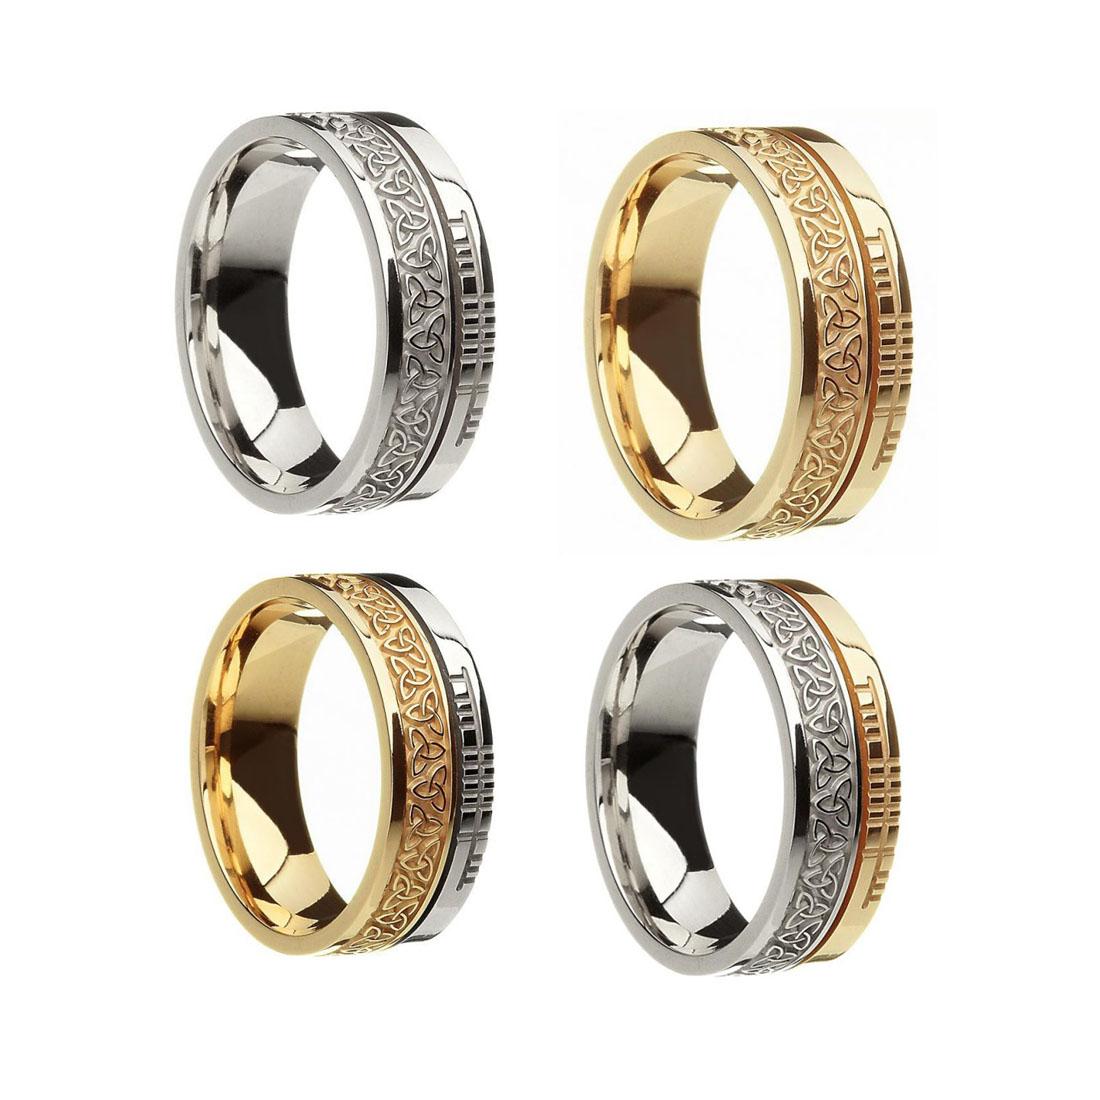 Faith Collection Trinity Knot Wedding Rings